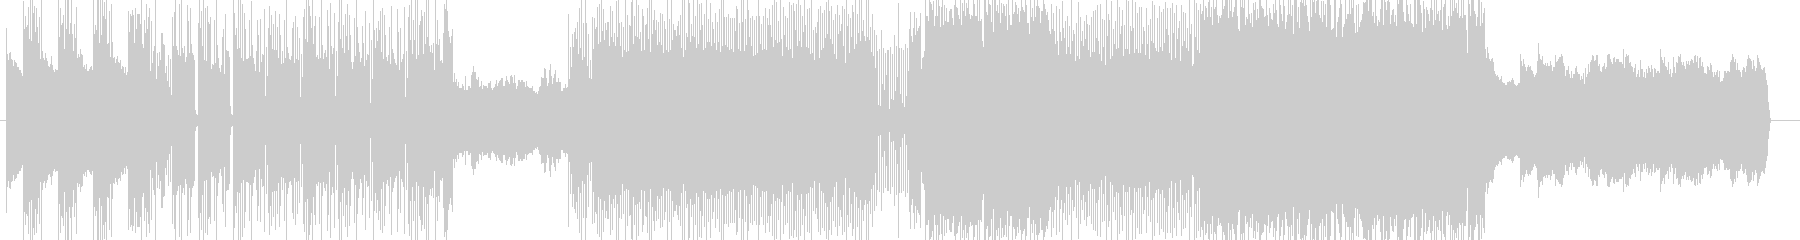 「HR/HM」「DARK系」BGM19の未再生の波形